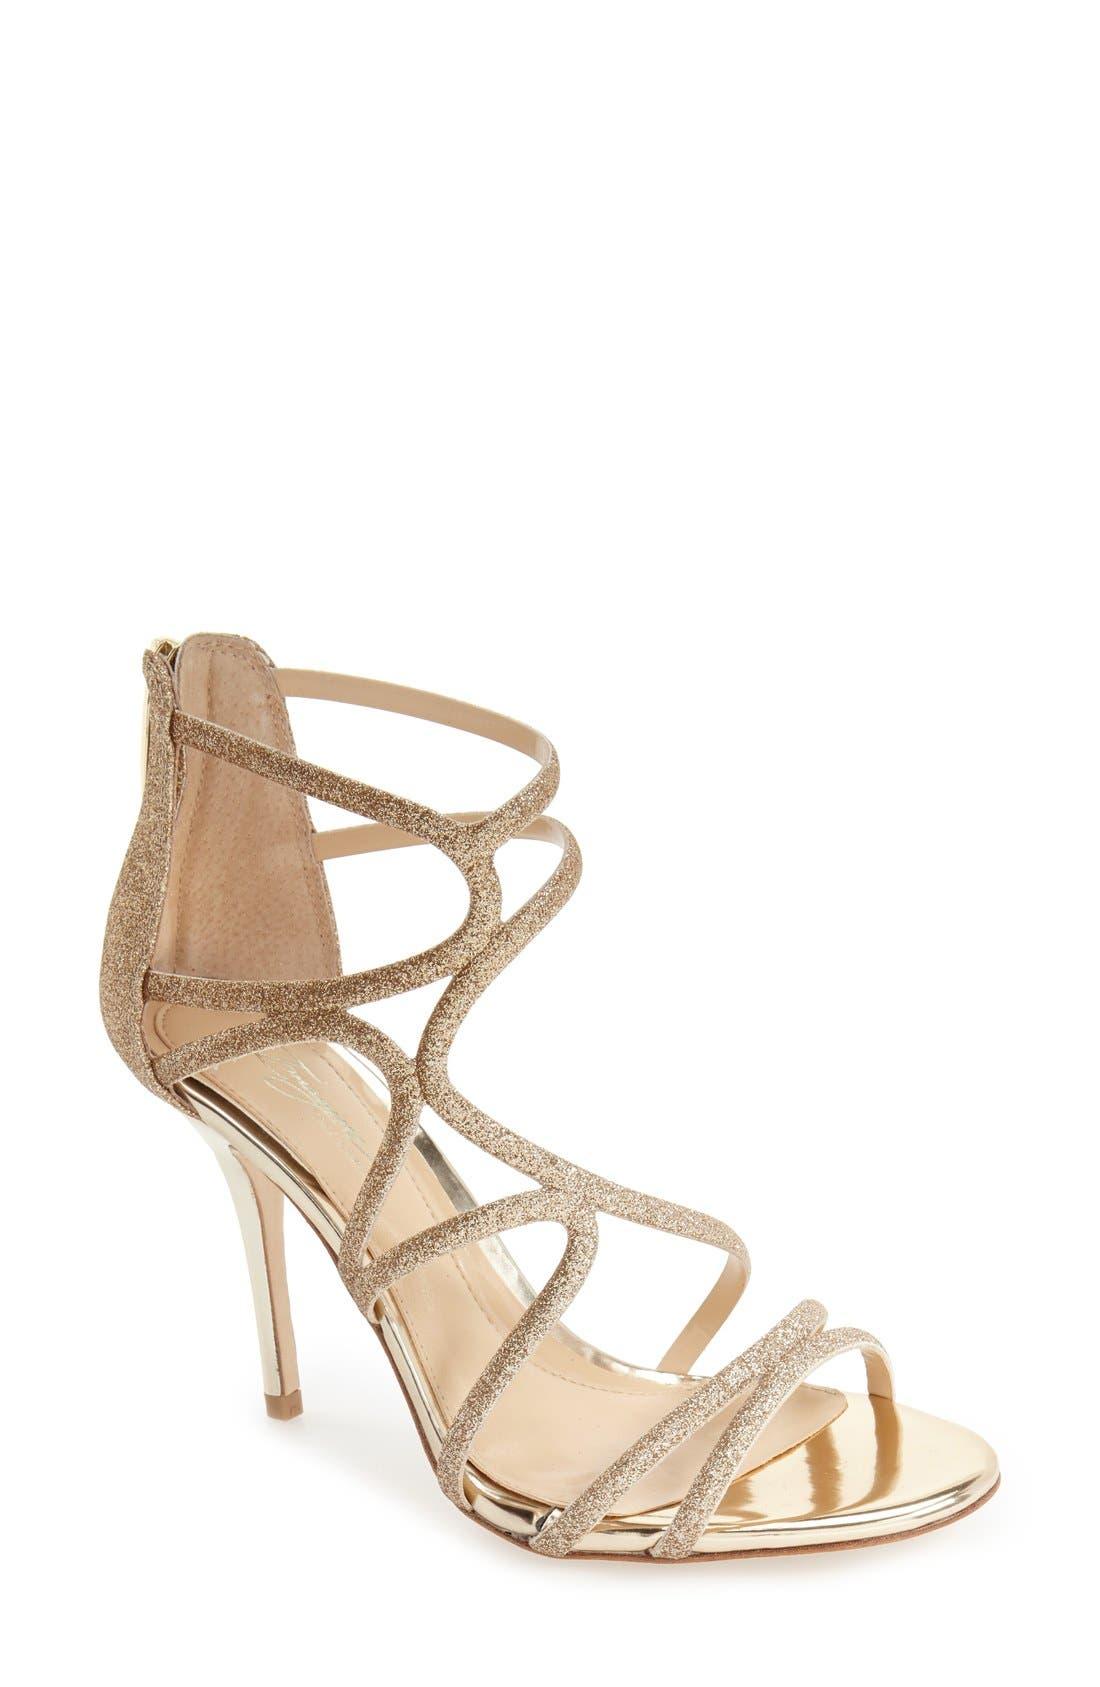 'Ranee' Dress Sandal,                             Main thumbnail 1, color,                             Champagne Leather